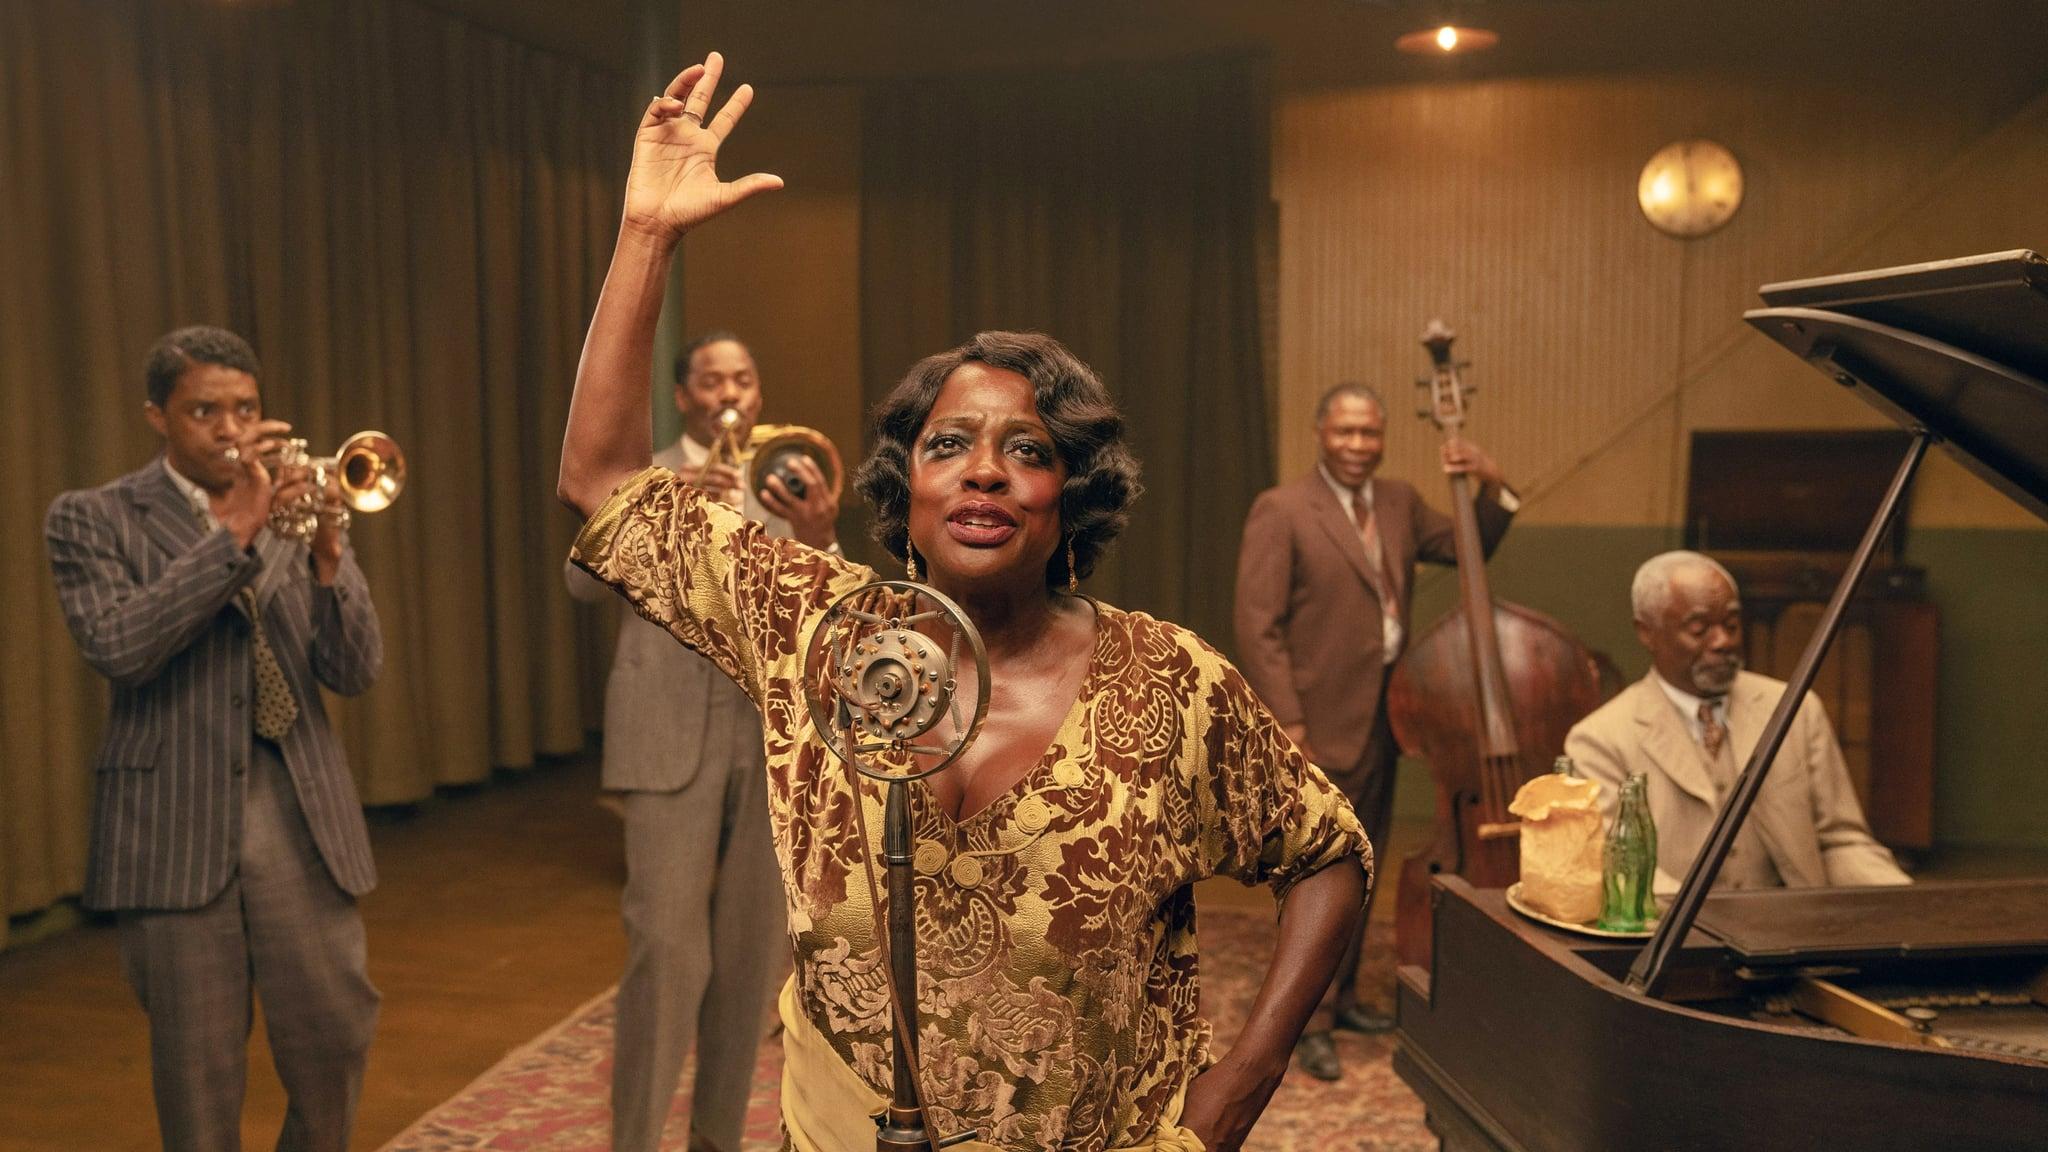 MA RAINEYS BLACK BOTTOM, from left: Chadwick Boseman, Colman Domingo, Viola Davis as Ma Rainey, Michael Potts, Glynn Turman, 2020. ph: David Lee /  Netflix / Courtesy Everett Collection